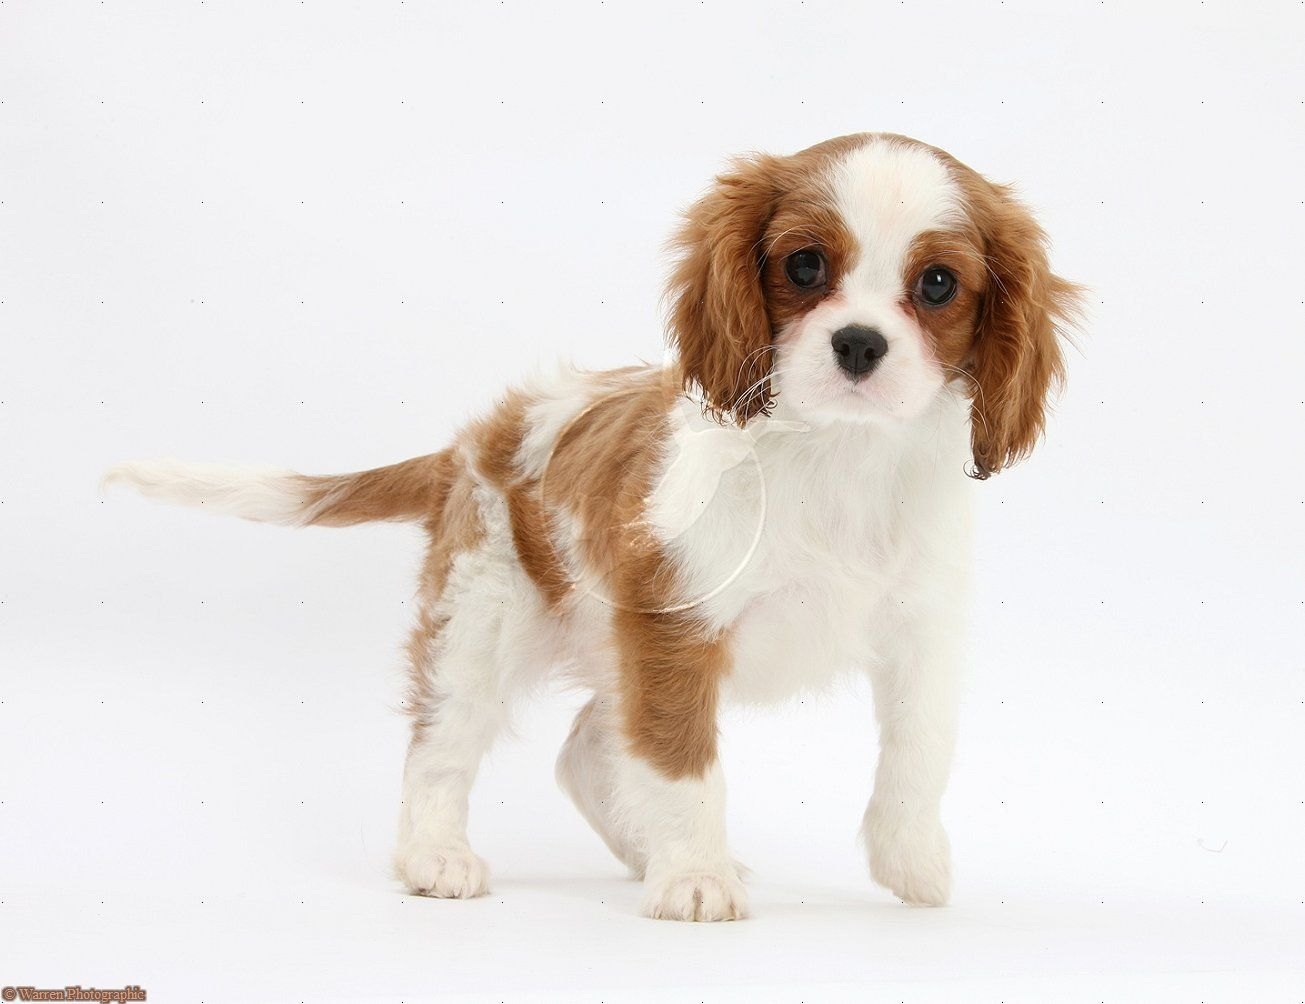 Dog: Cavalier King Charles Spaniel pup